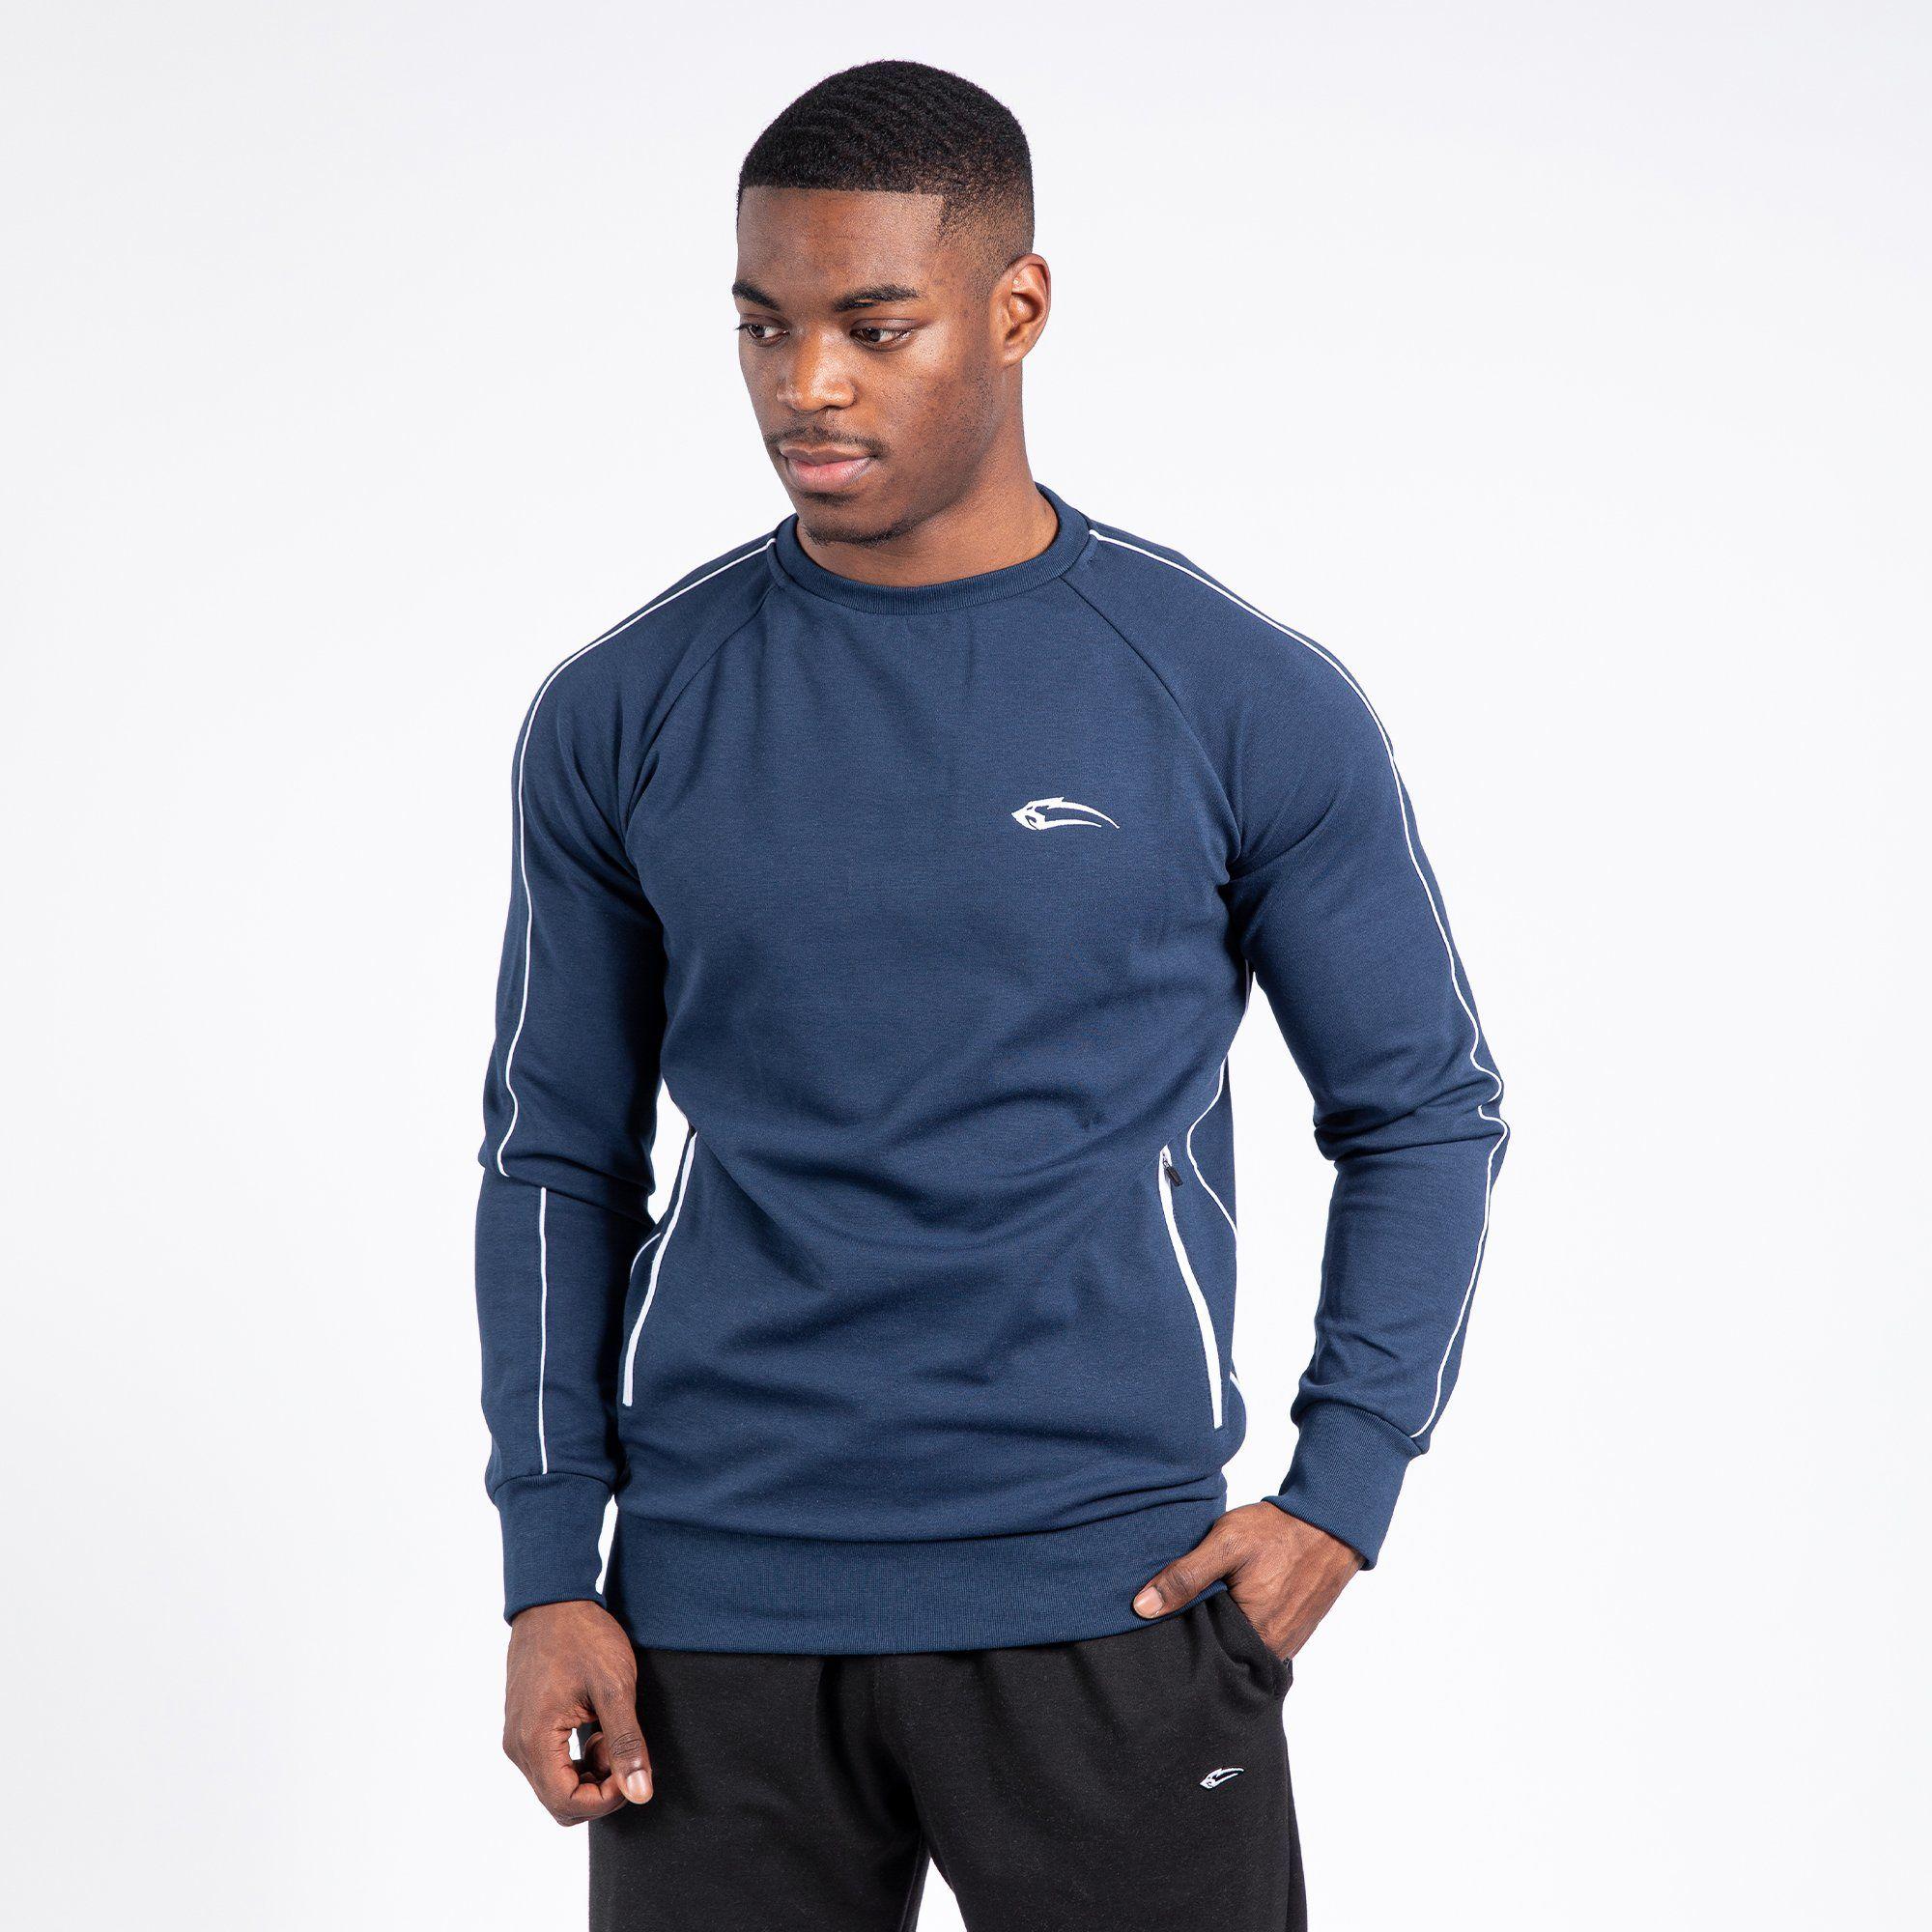 Sweatshirt Zane – Blau / 4XL